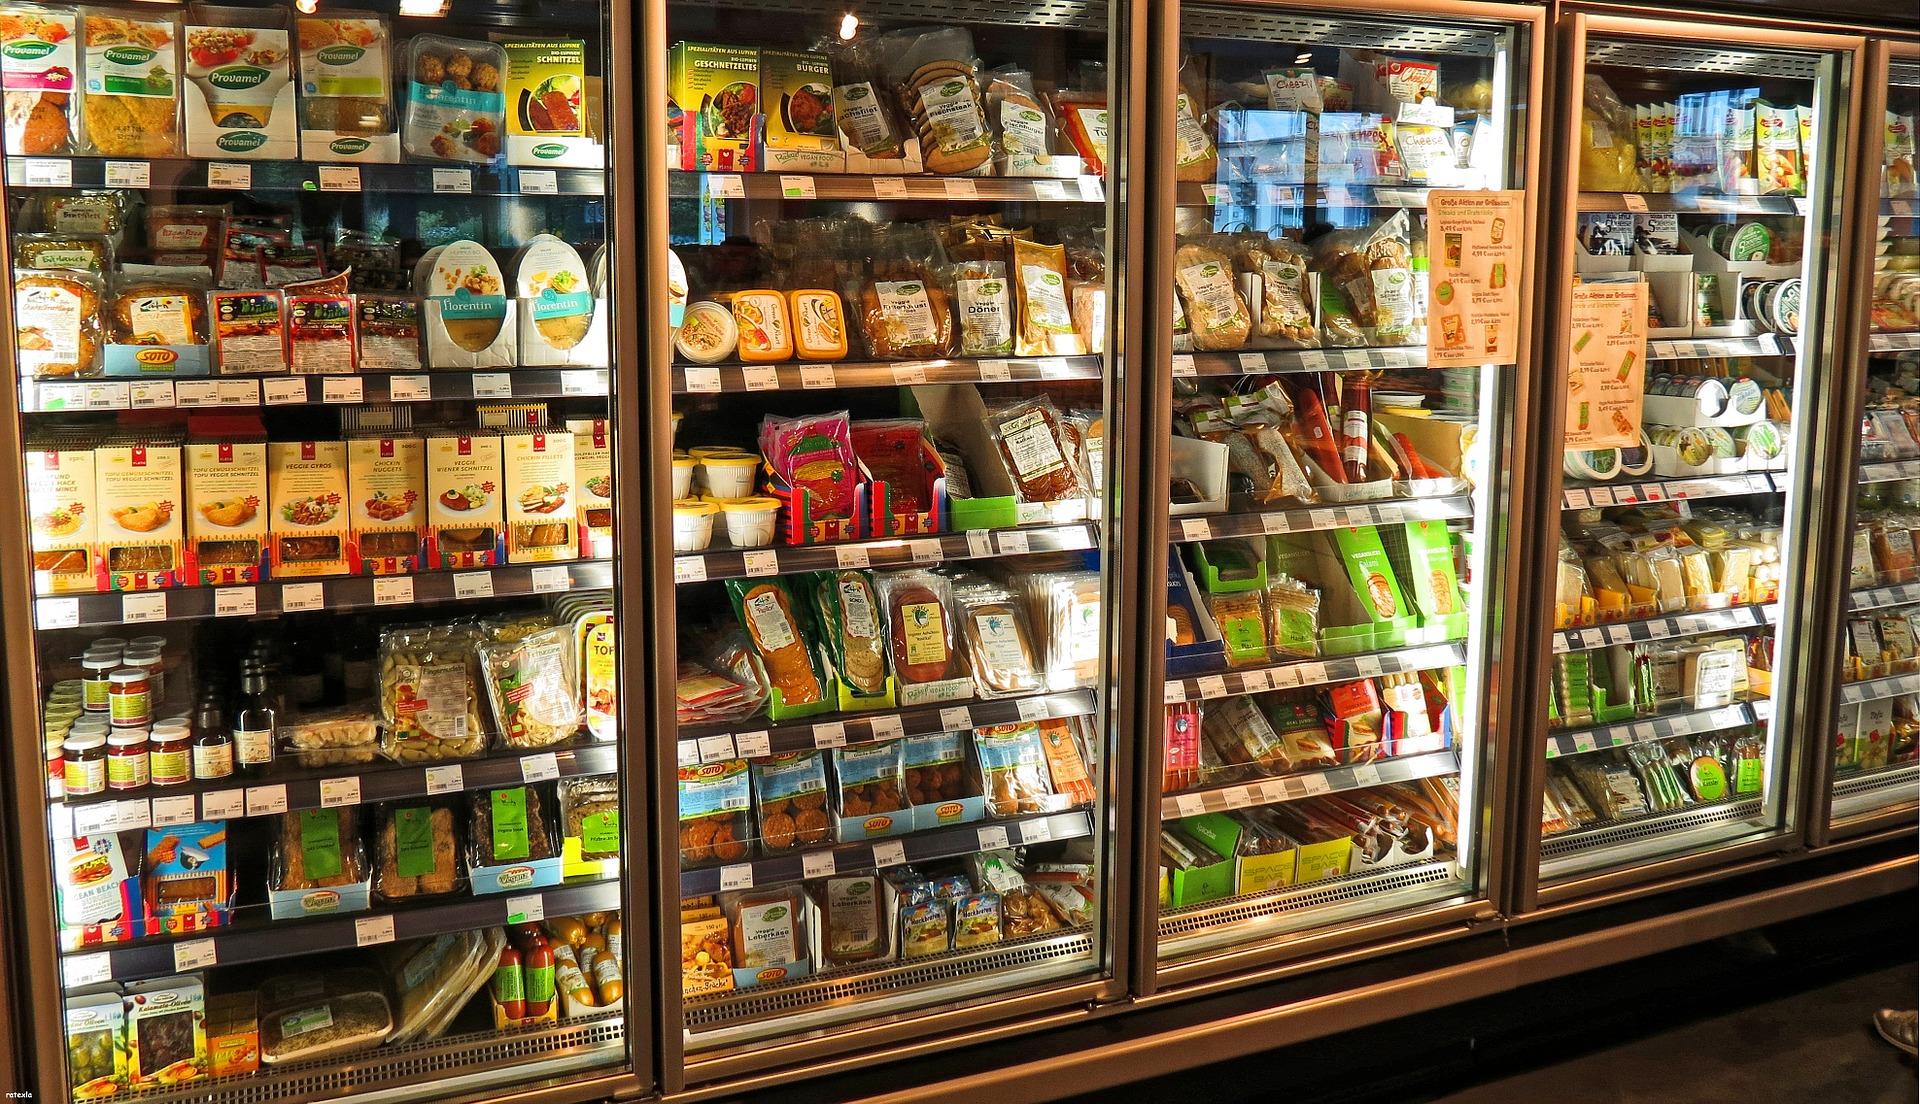 Zona de comida procesada en supermercado